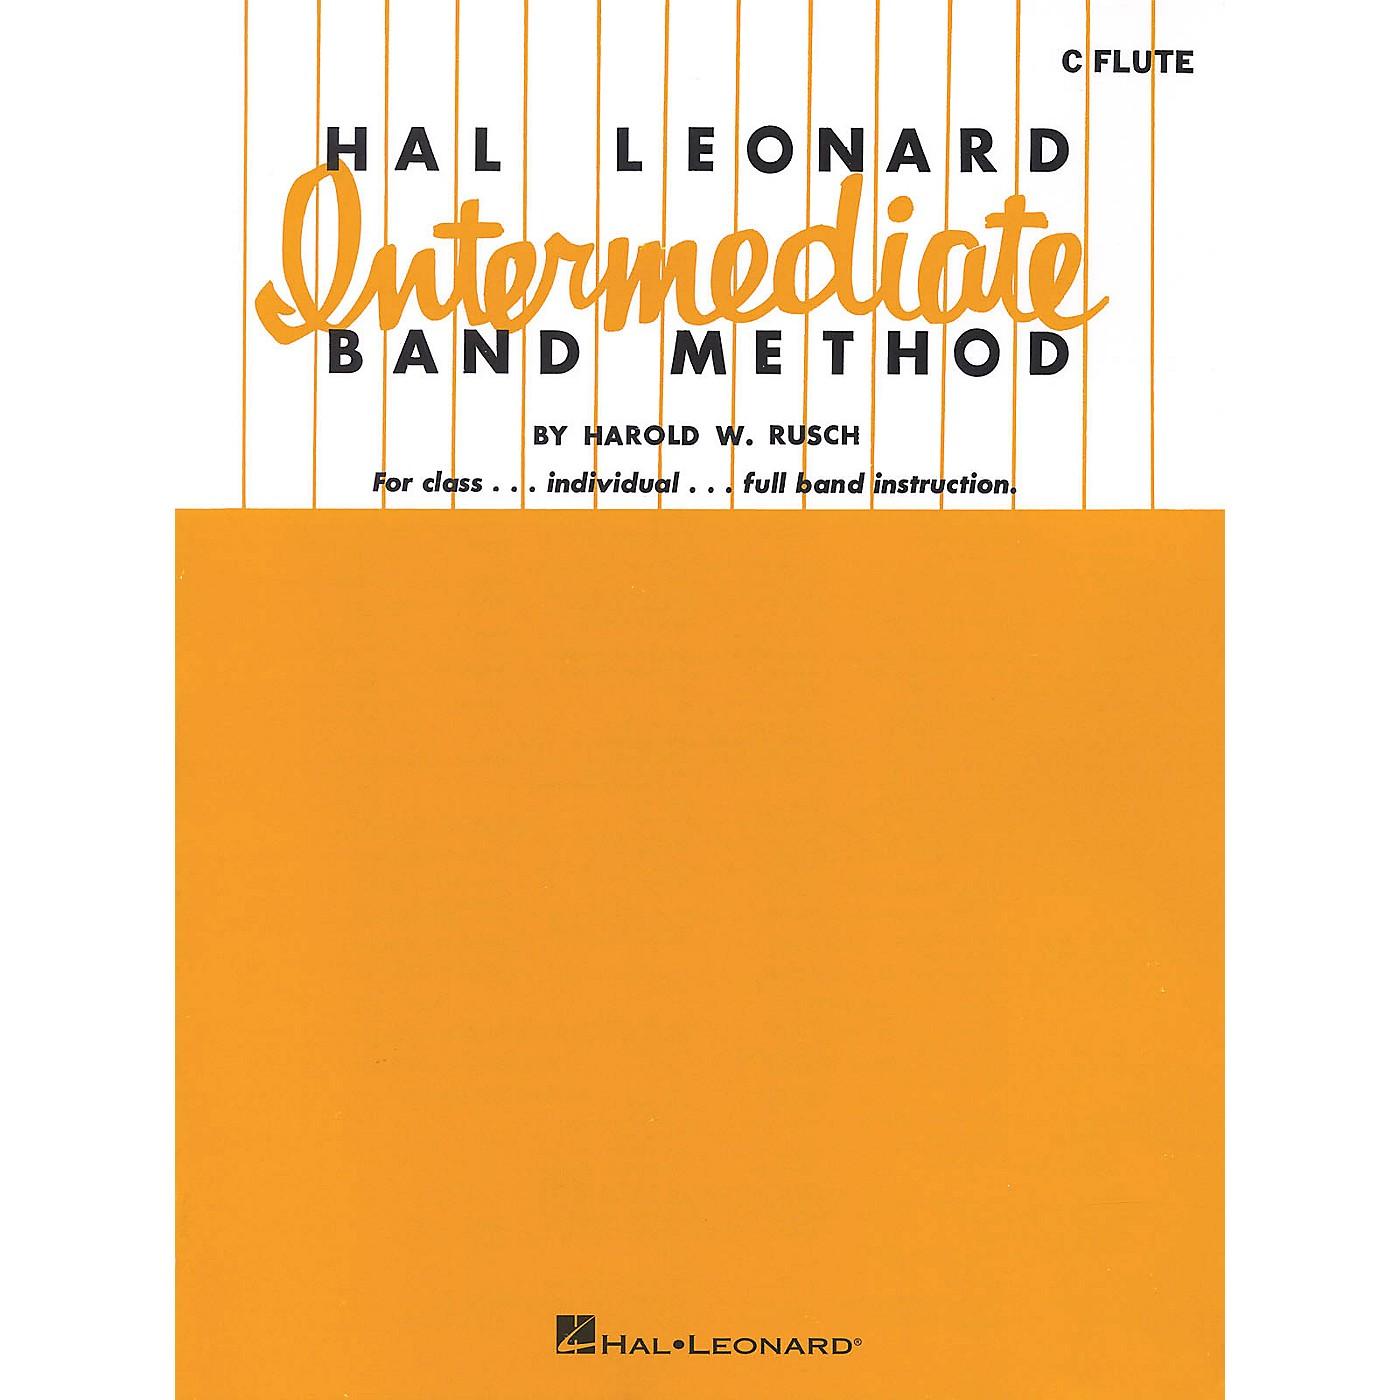 Hal Leonard Hal Leonard Intermediate Band Method (Bb Bass Clarinet) Intermediate Band Method Series thumbnail